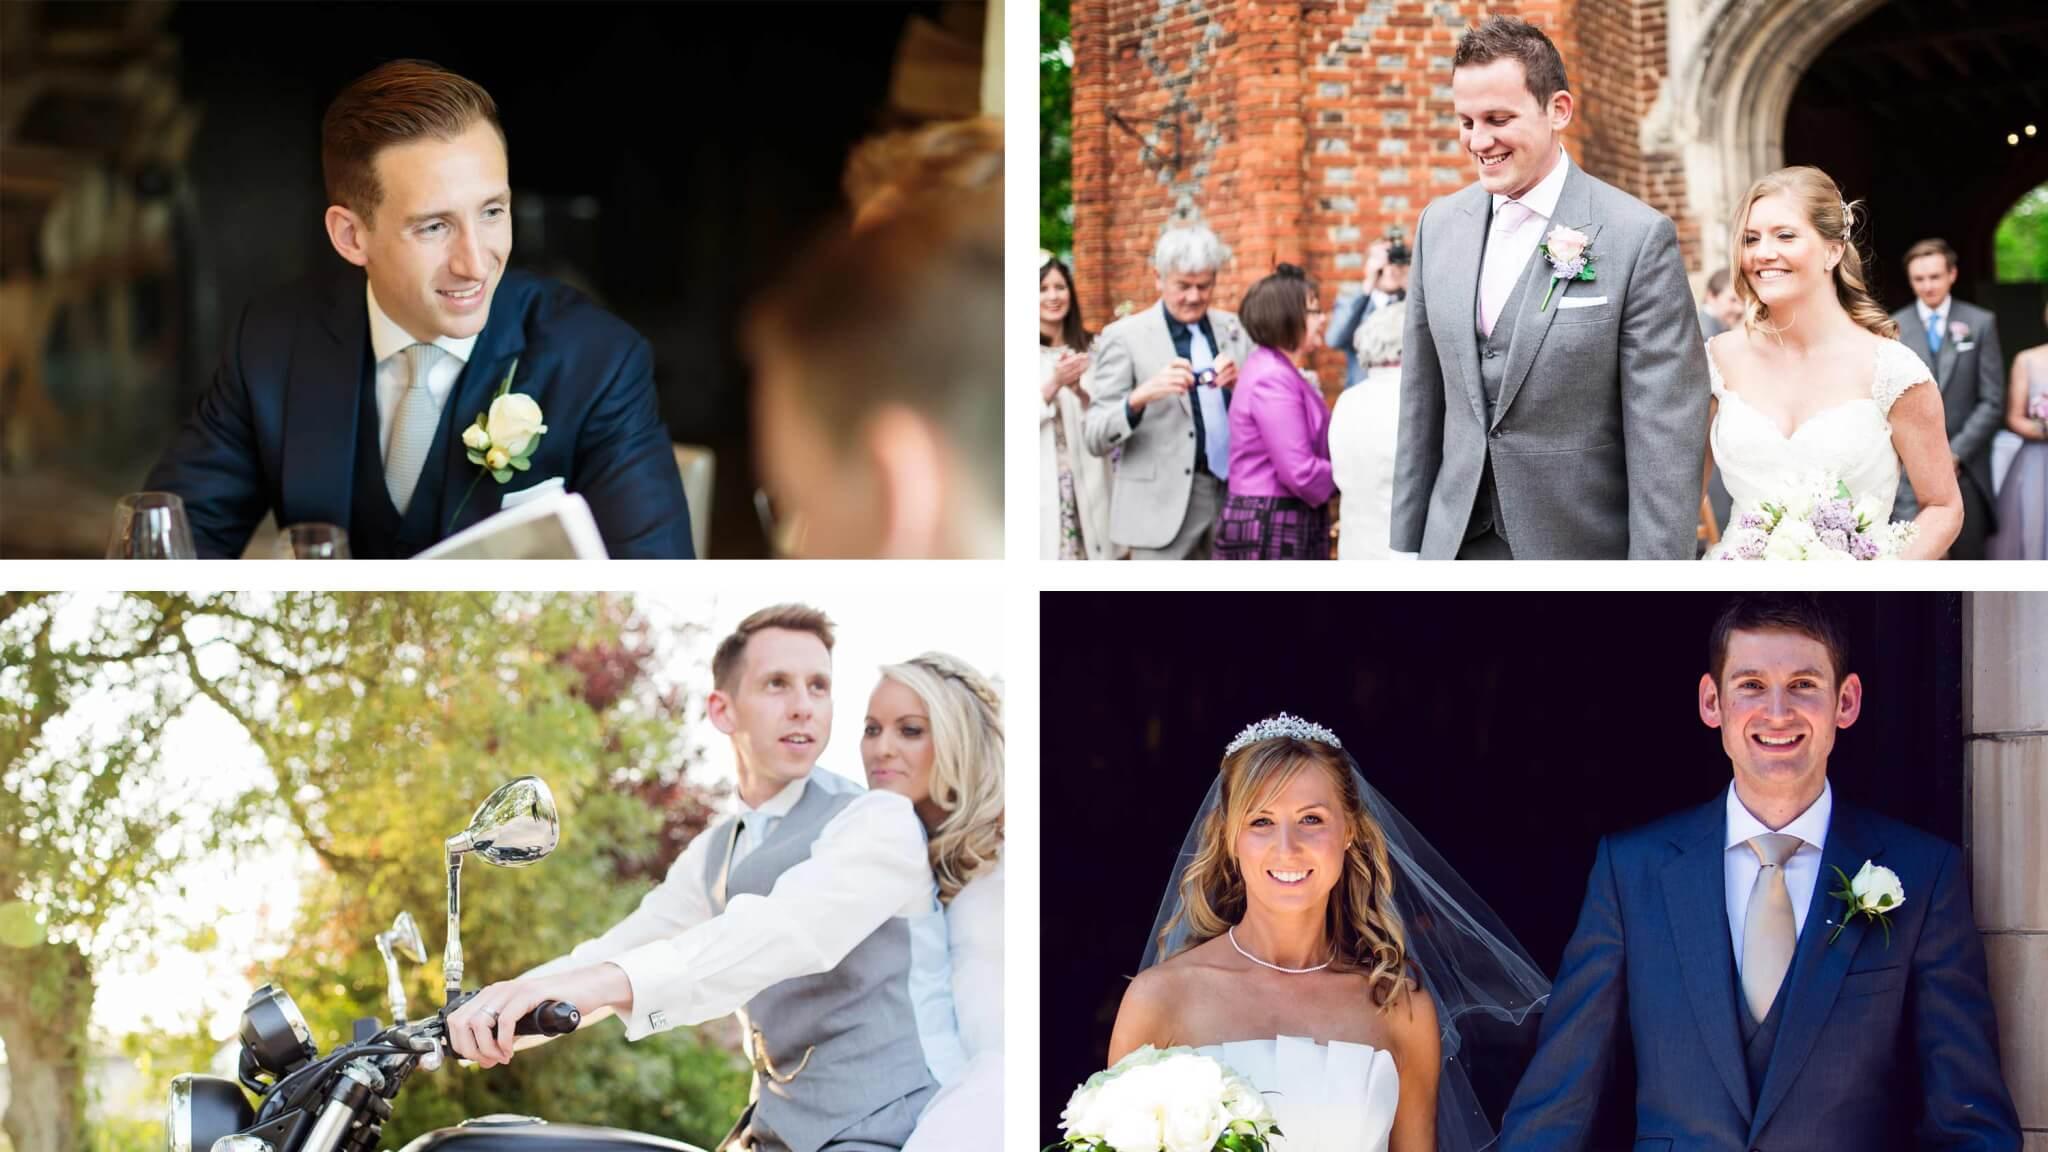 Savile Row Bespoke Wedding Suits